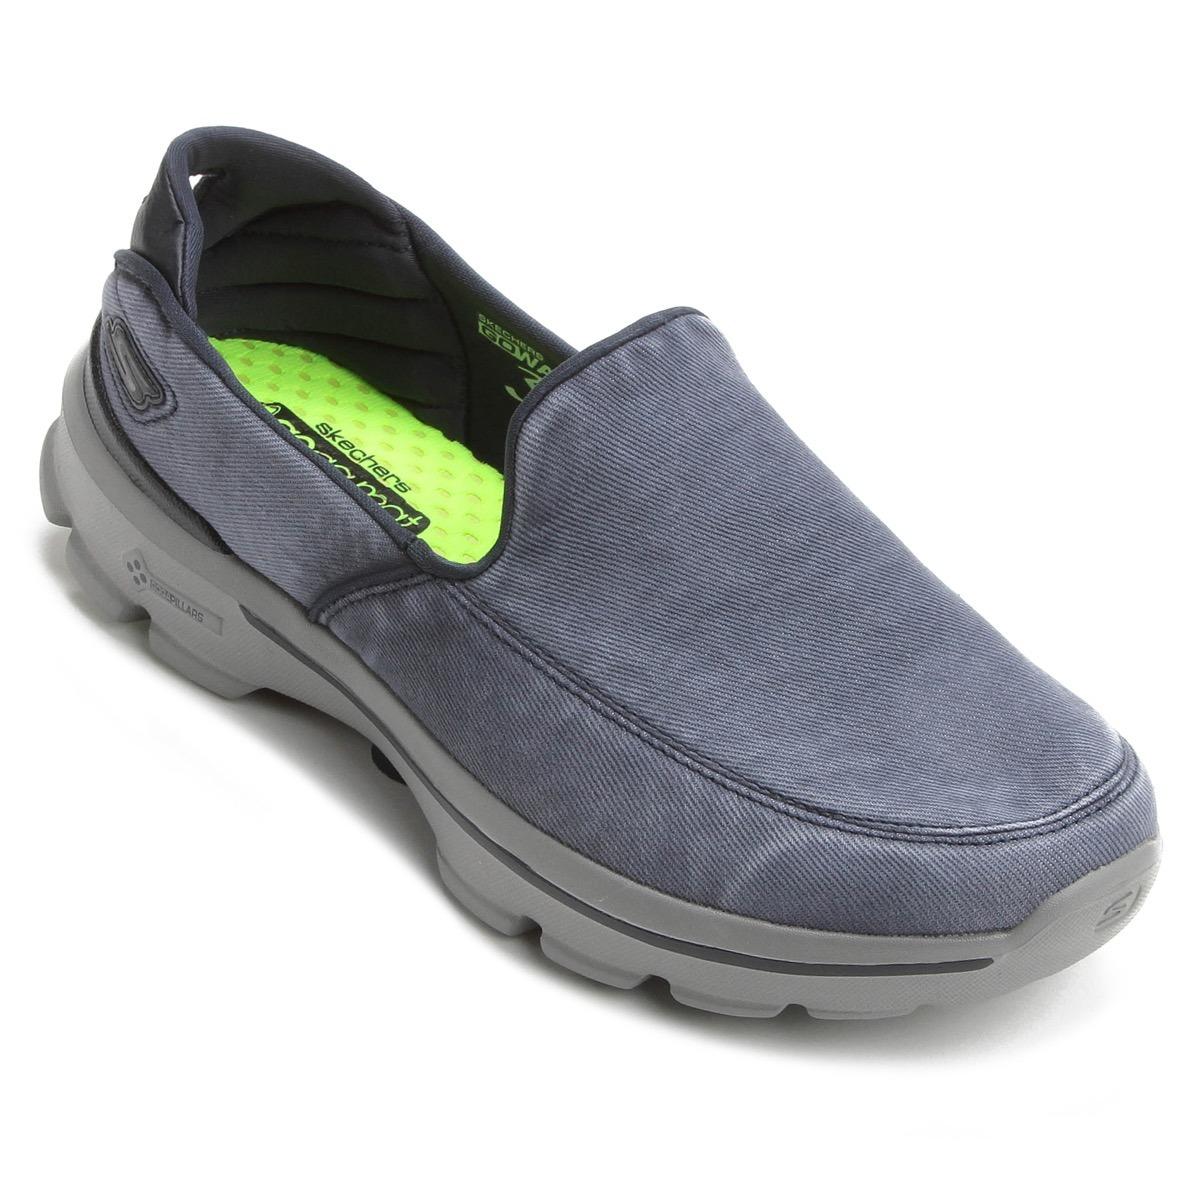 596f3626b64 tênis skechers go walk 3 unwind masculino caminhada azul. Carregando zoom.